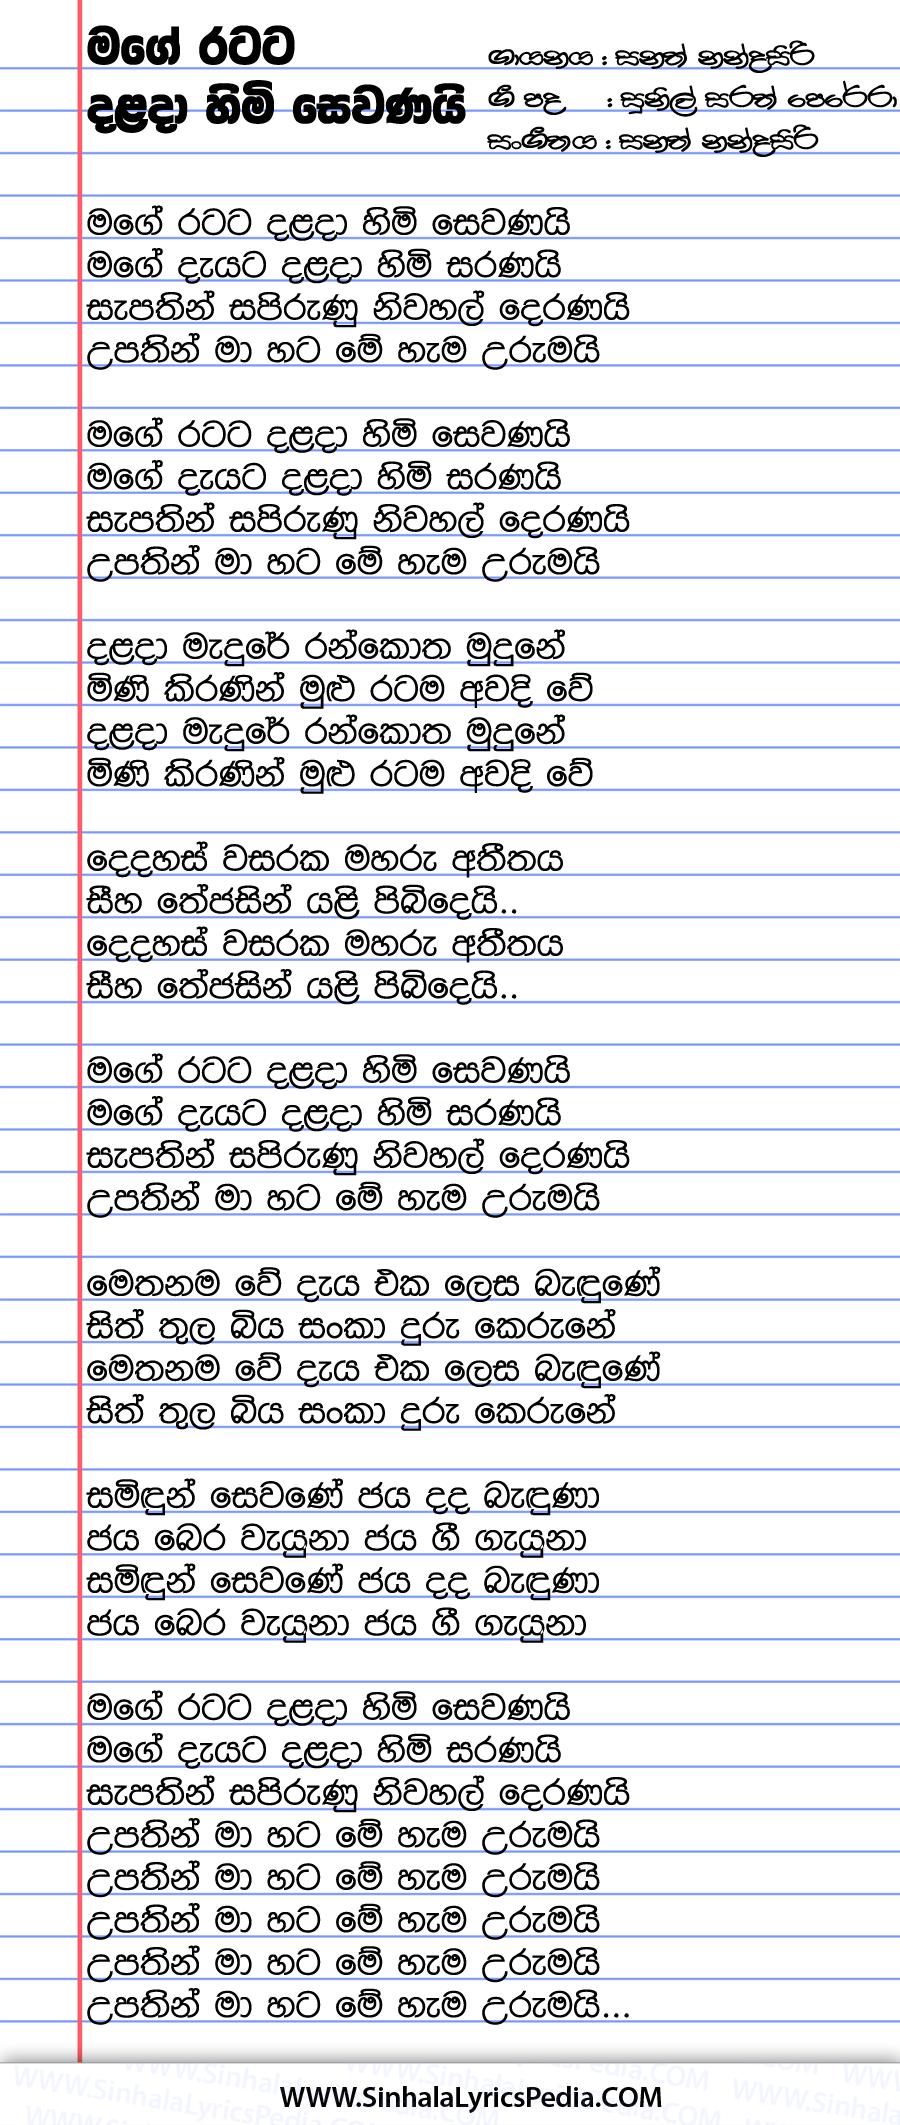 Mage Ratata Dalada Himi Saranai Song Lyrics